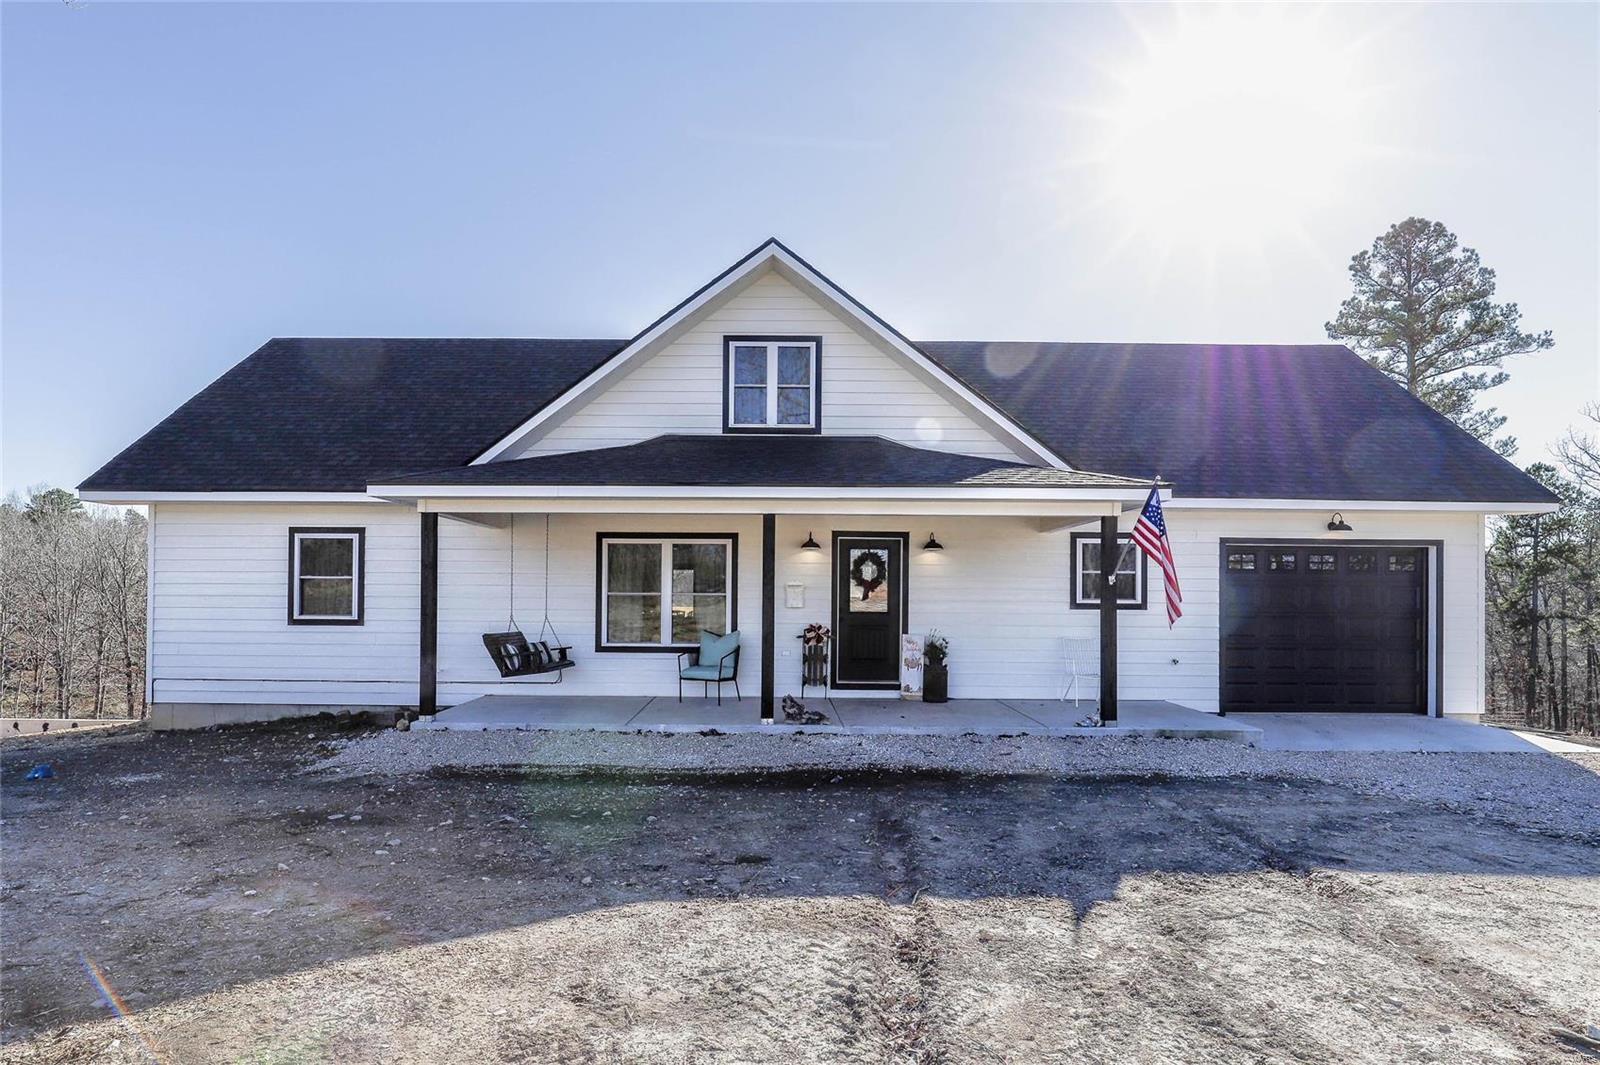 167 Carter 205 Property Photo - Van Buren, MO real estate listing